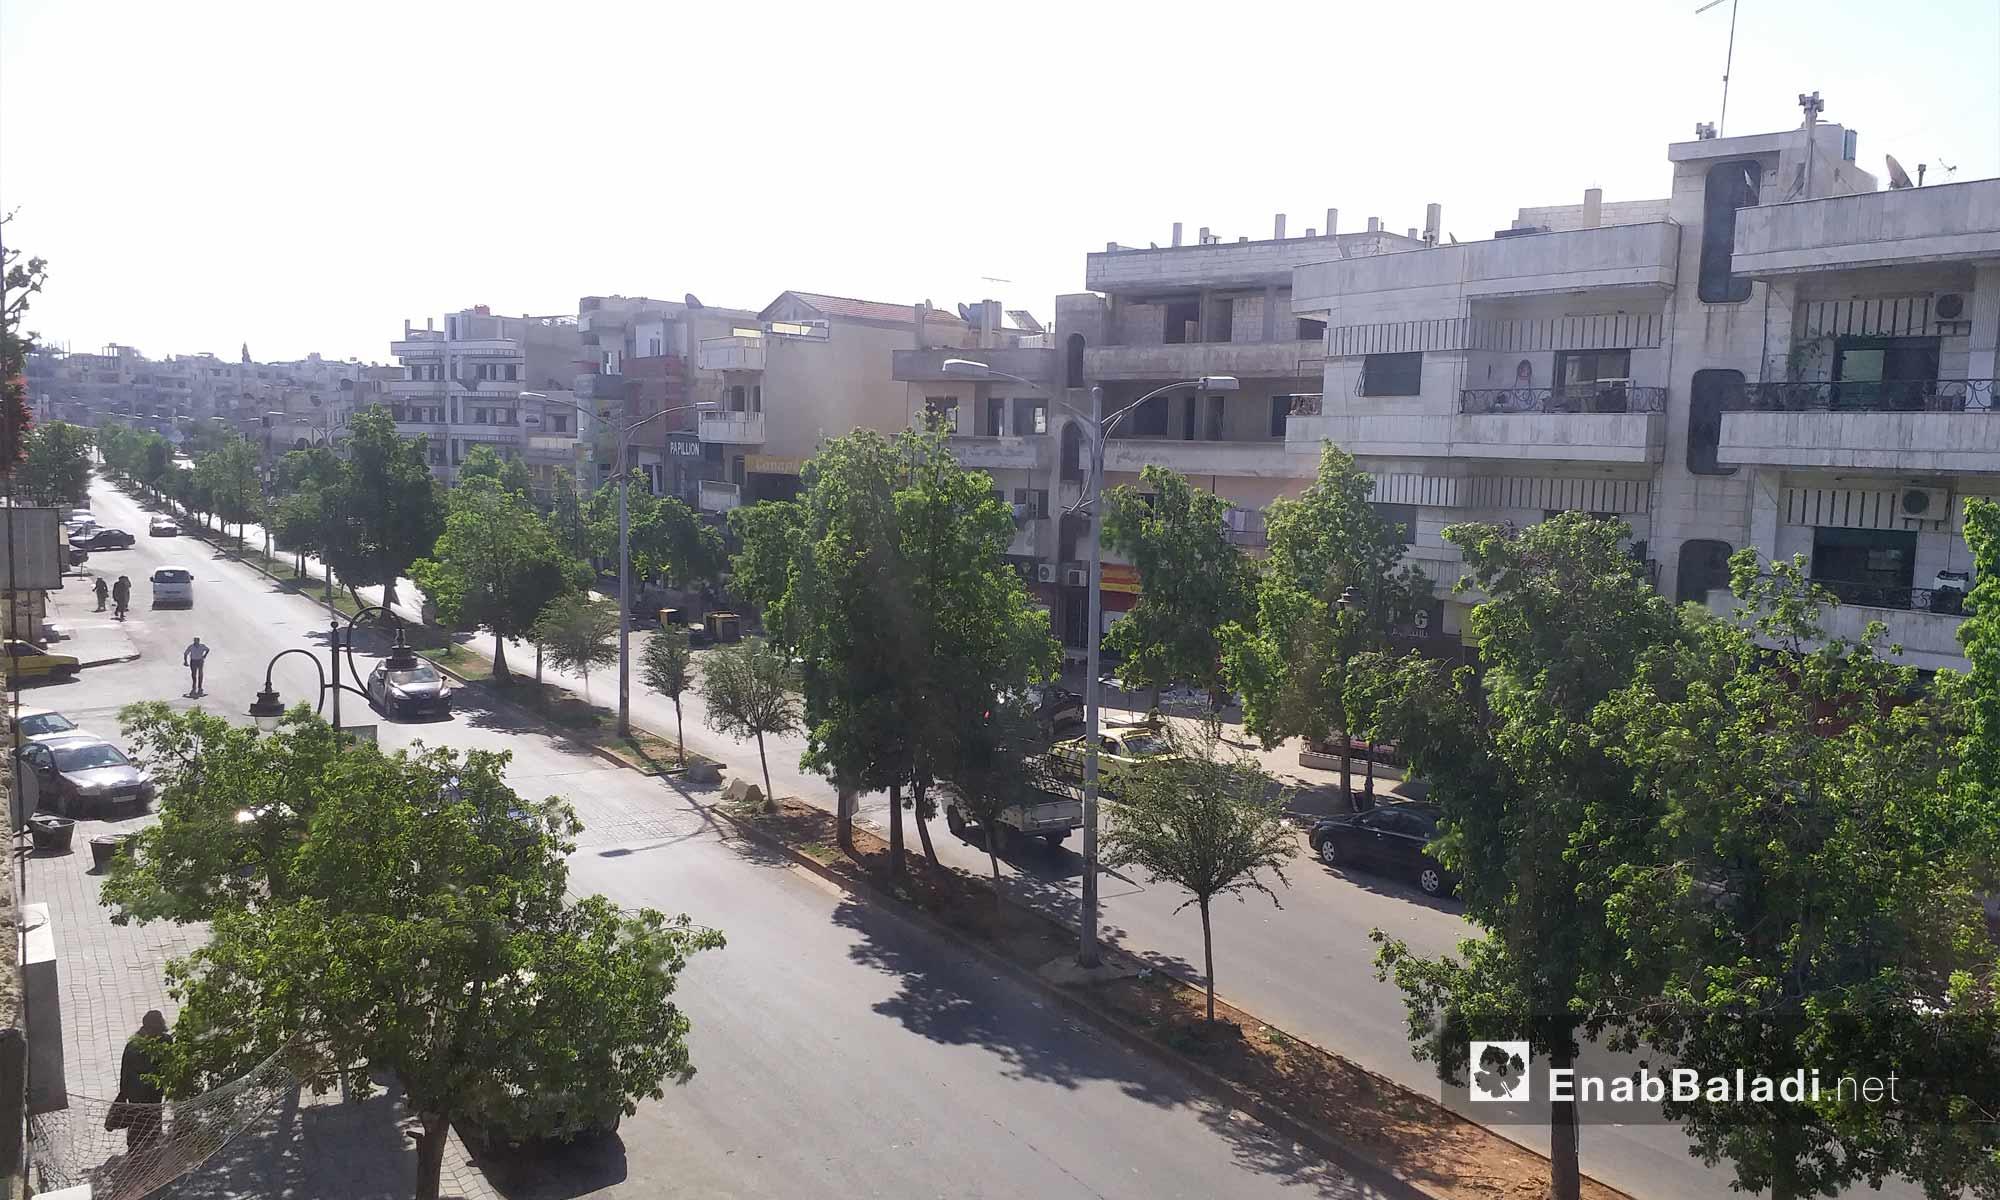 Al-Ghouta street, Homs city - August 19, 2018 (Enab Baladi)